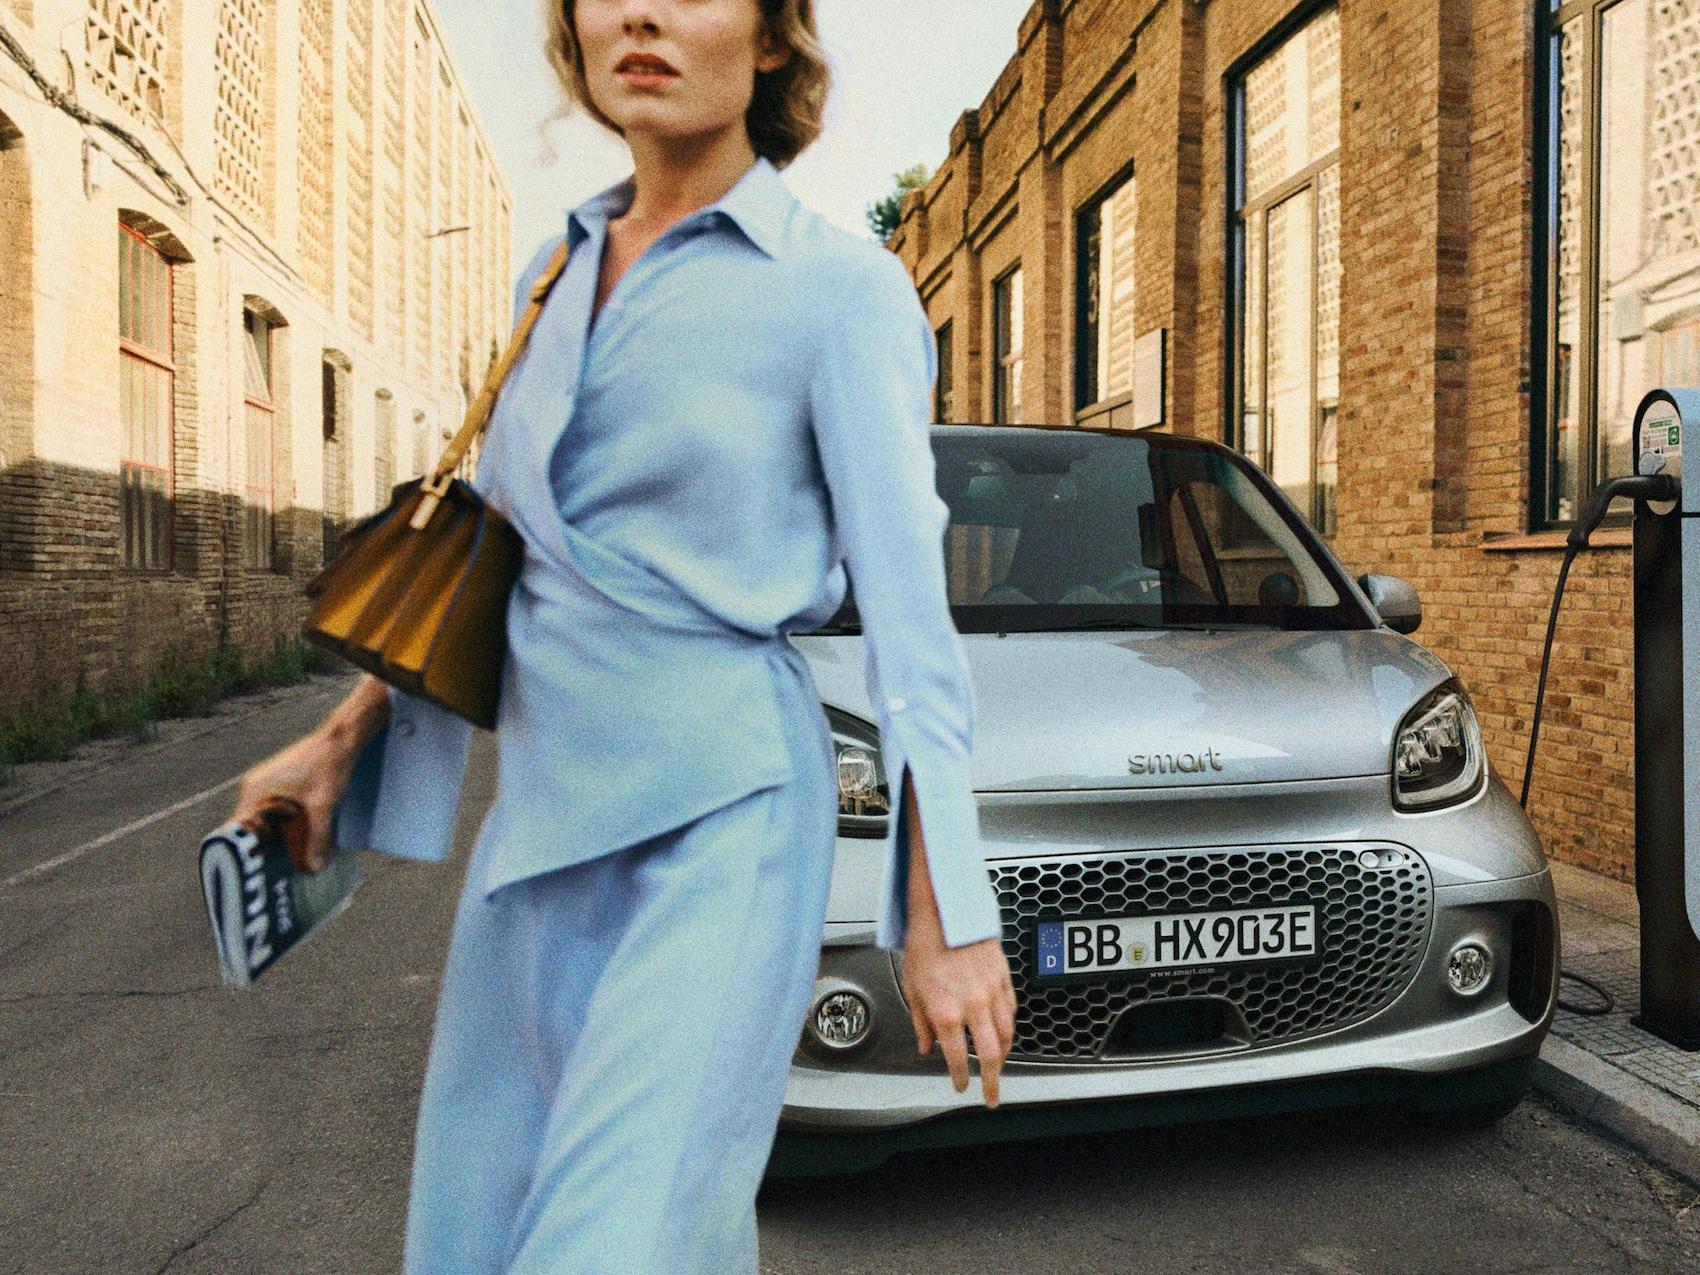 smart EQ forfour mit Frau in blauem Kleid